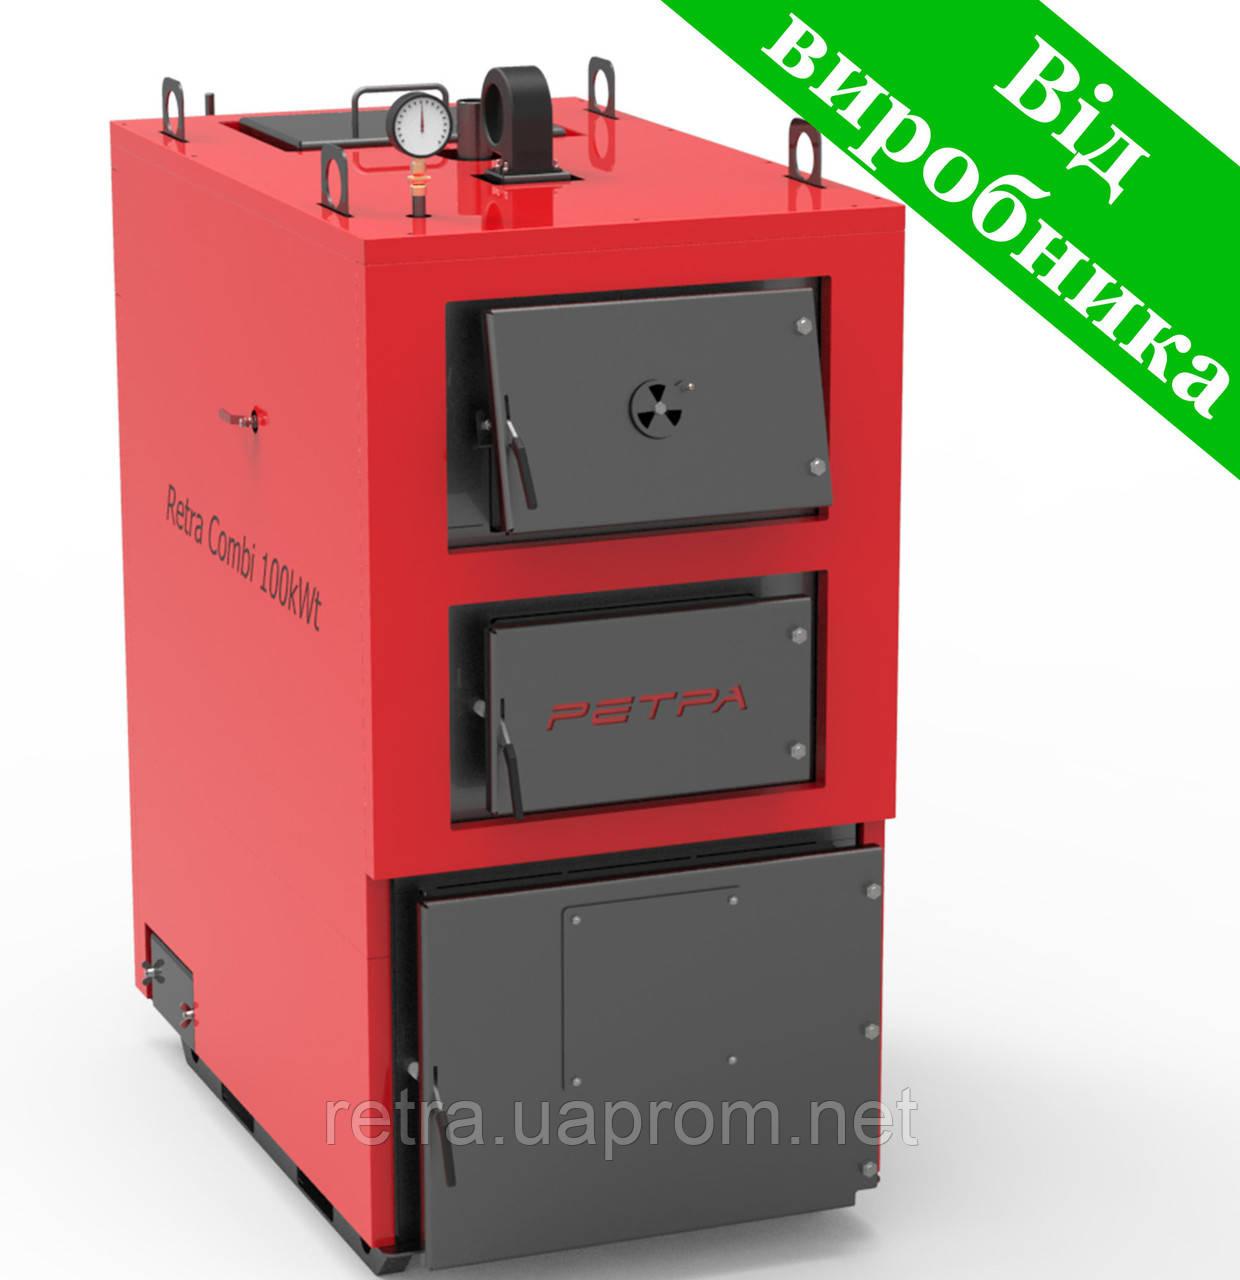 Котел твердотопливный Ретра-4М Combi 50 кВт